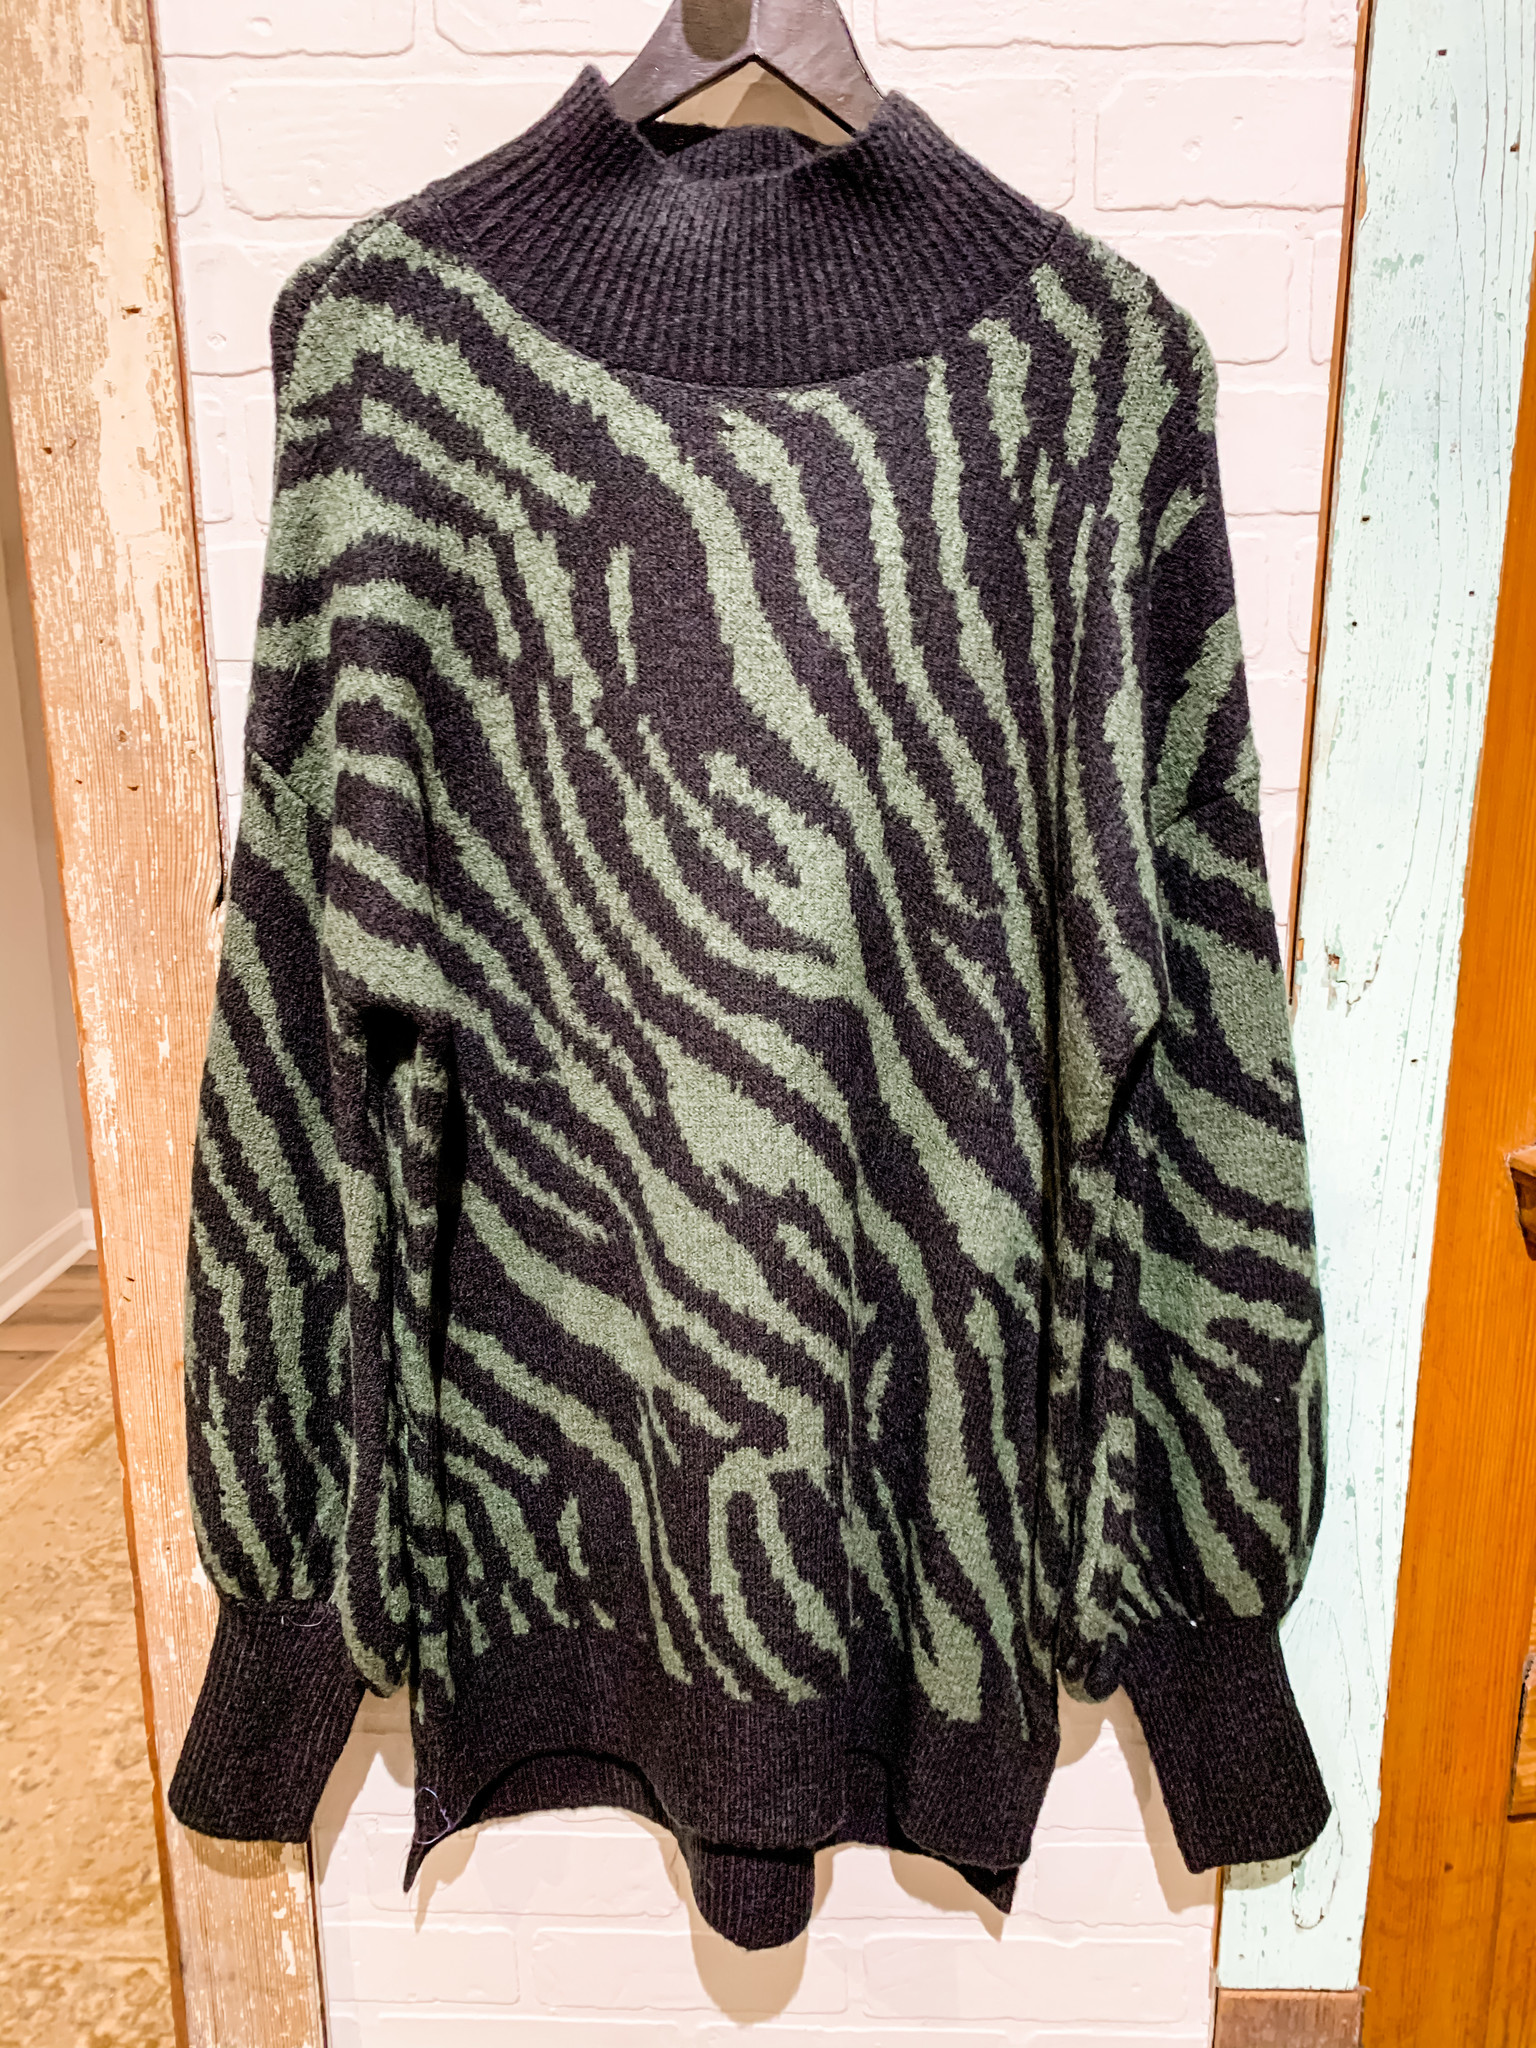 Envy Label Zebra Stripes Sweater